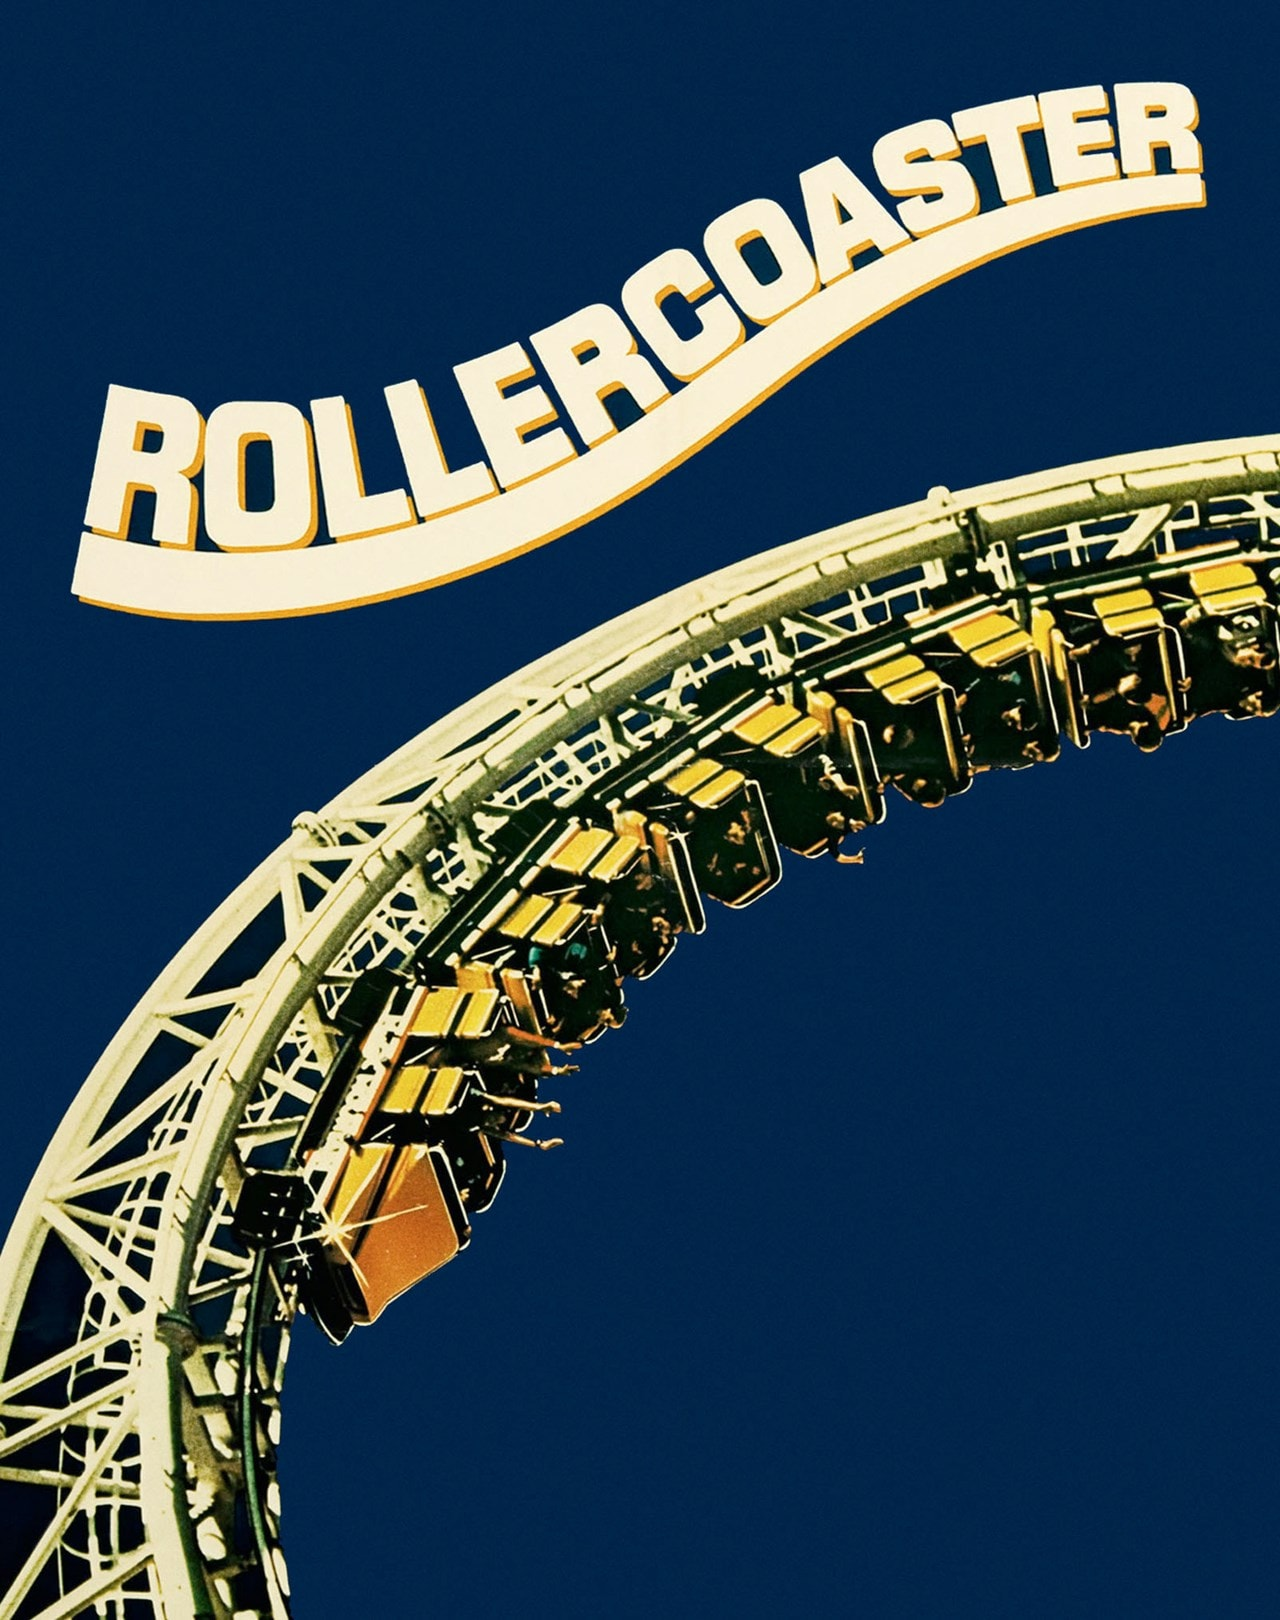 Rollercoaster - 2